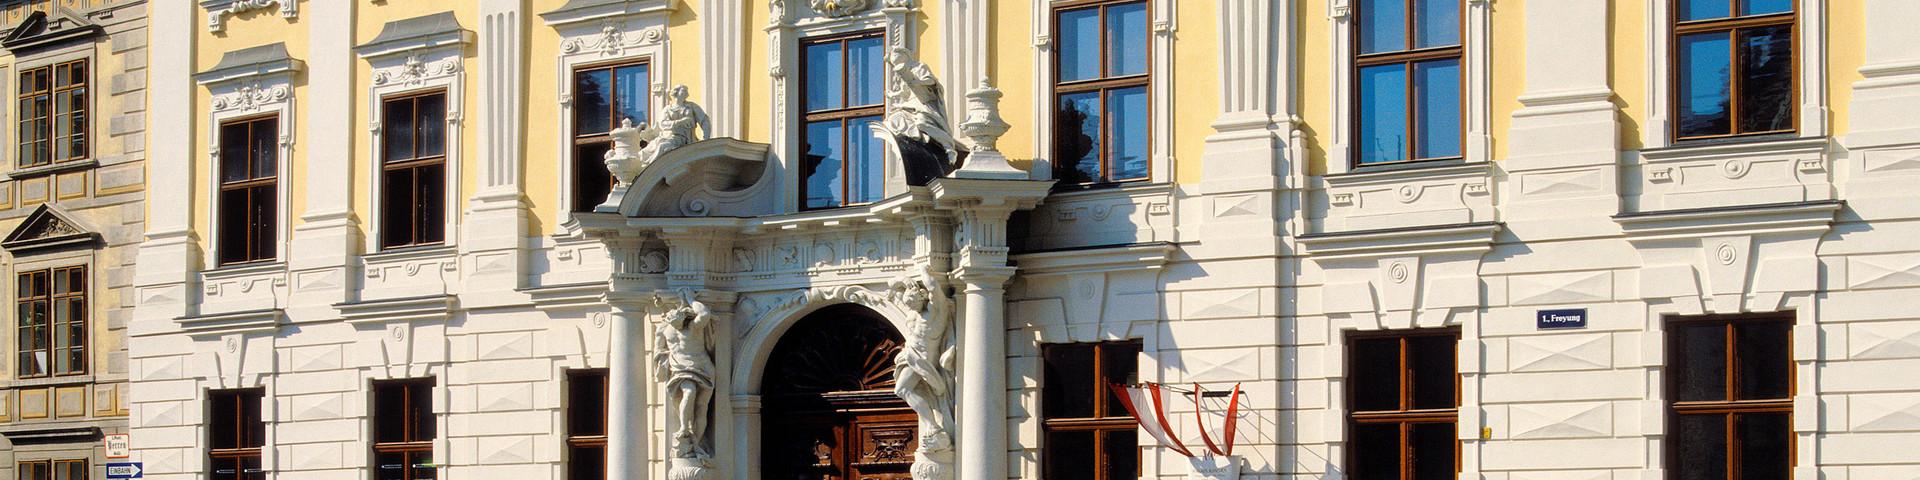 Palais Daun-Kinsky - Aussenansicht © Palais Daun-Kinsky, Wien